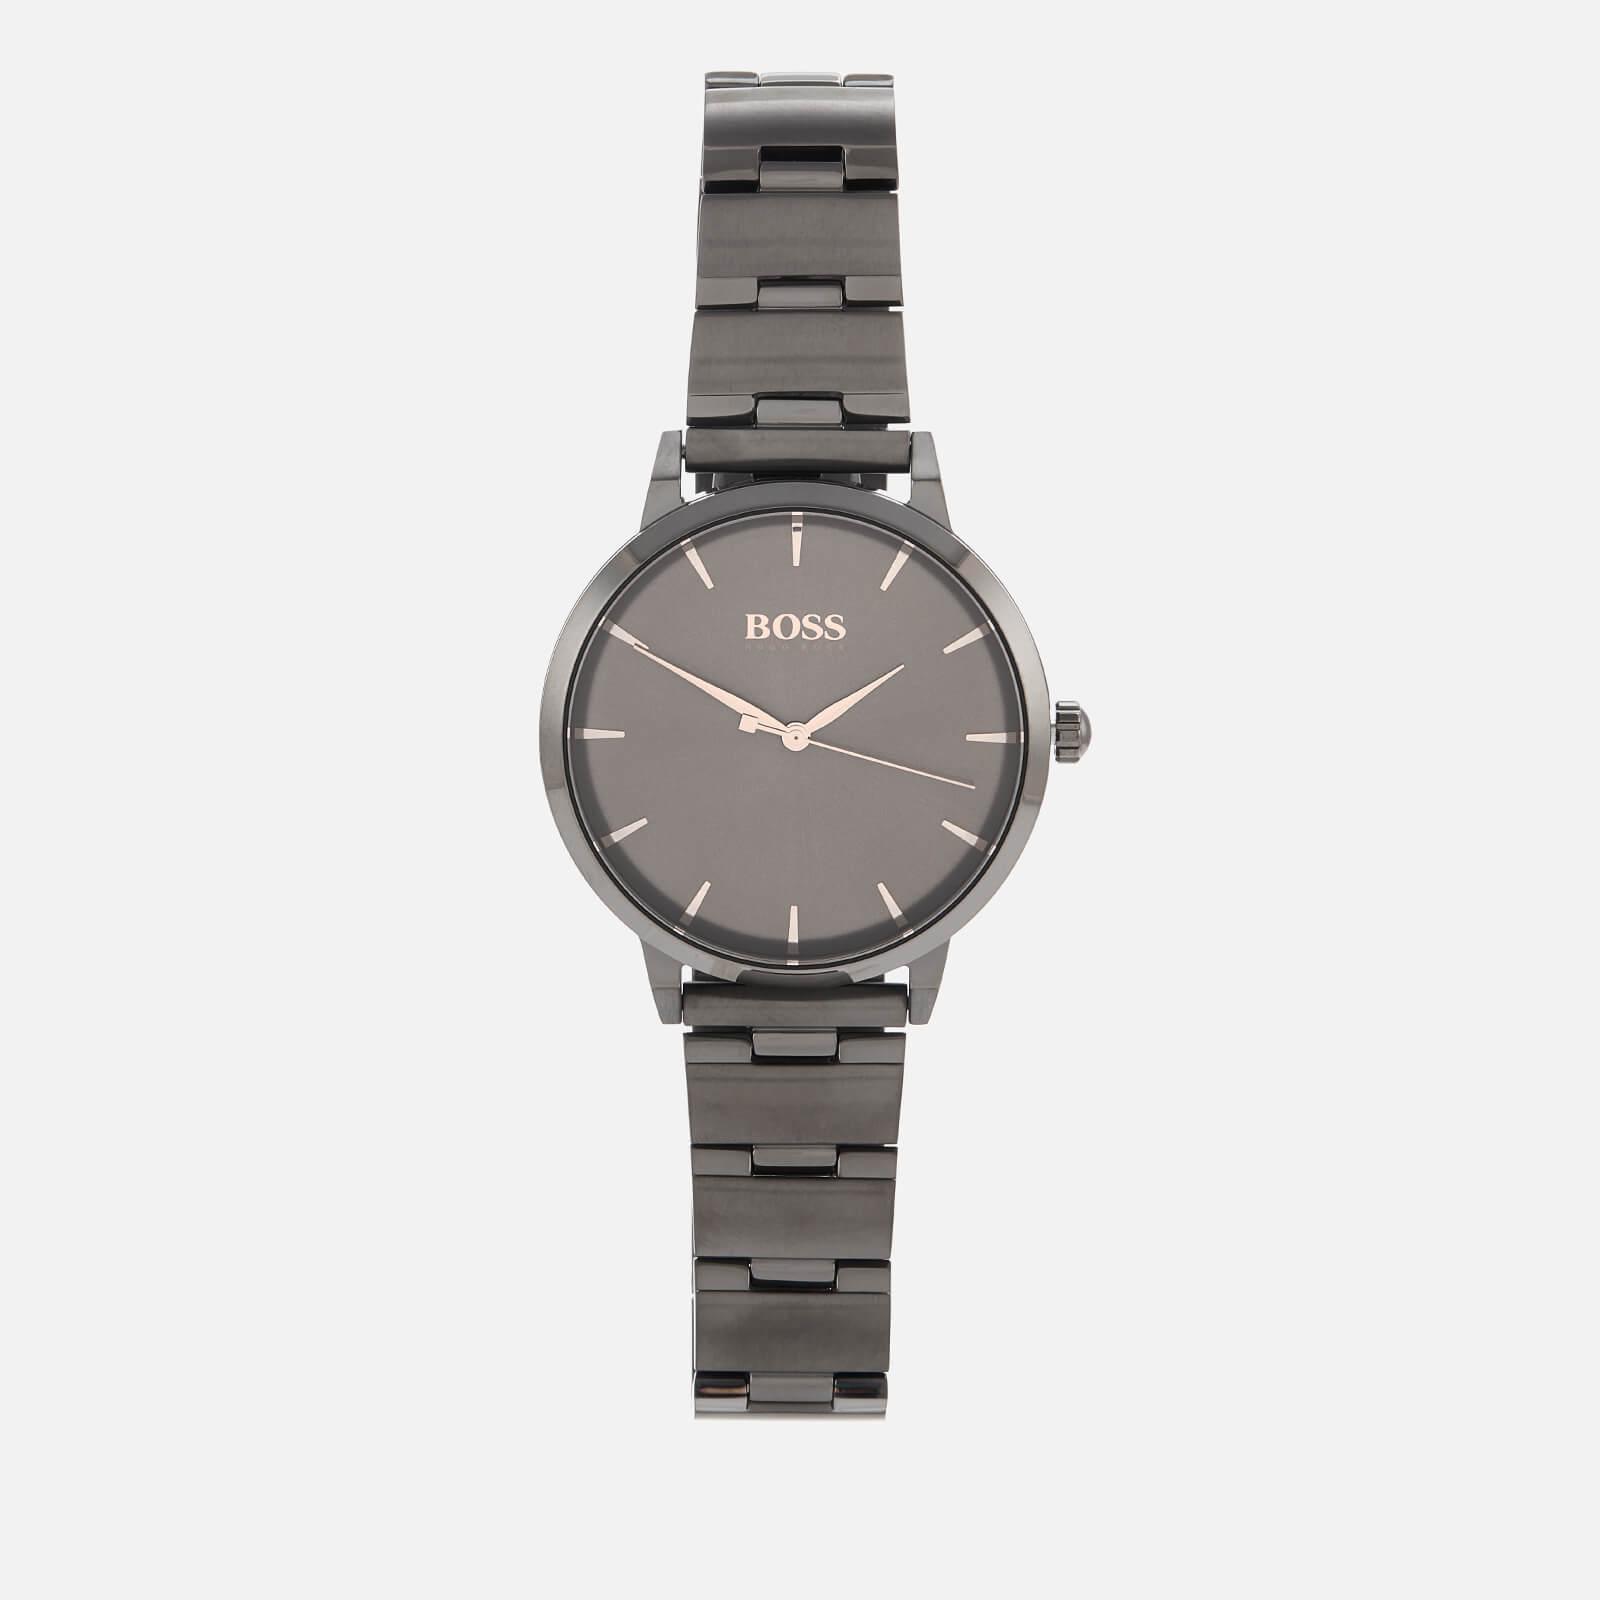 BOSS Hugo Boss Women's Marina Metal Strap Watch - Rouge/Black